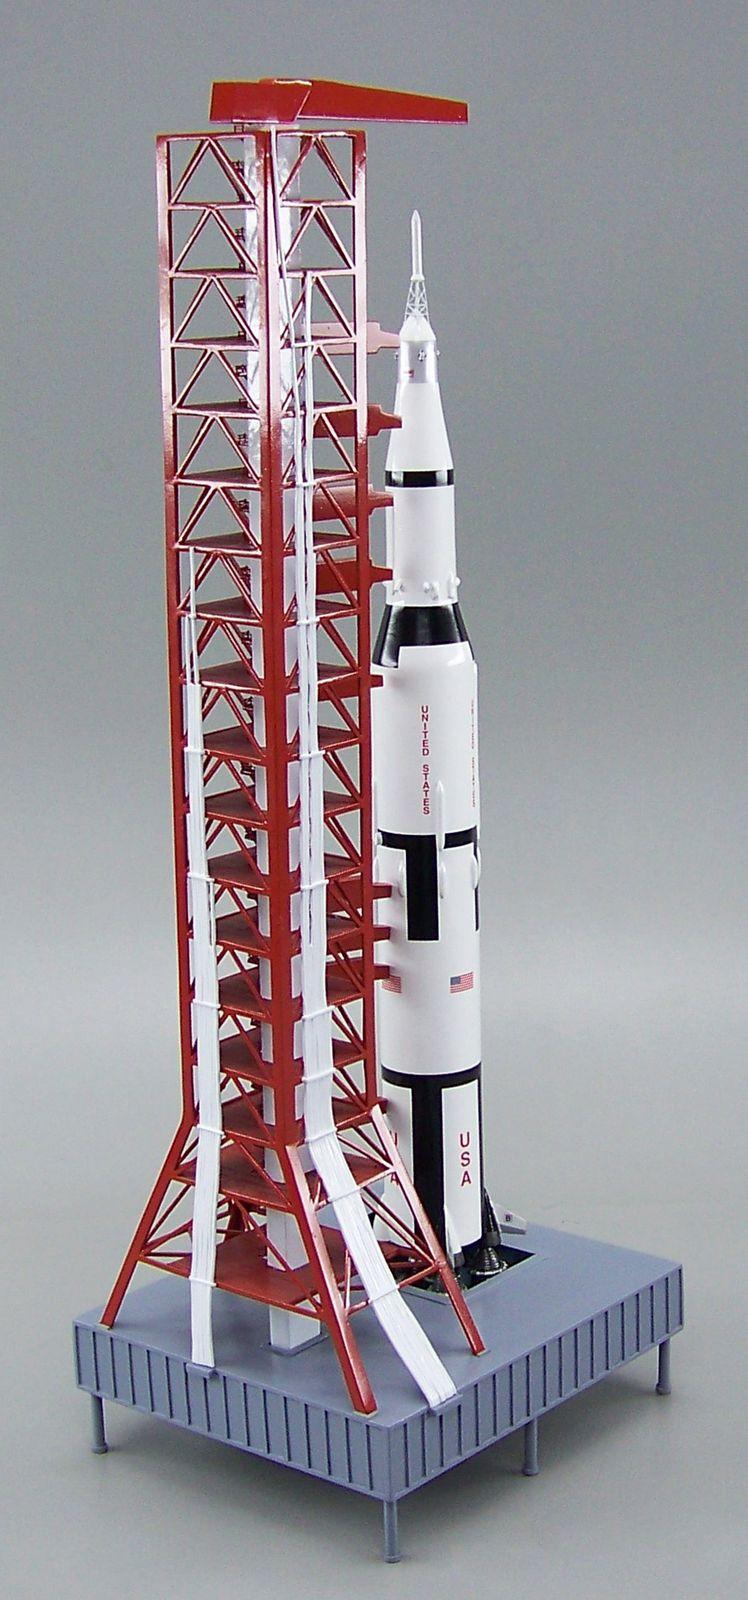 apollo 5 rocket space ship models - photo #30